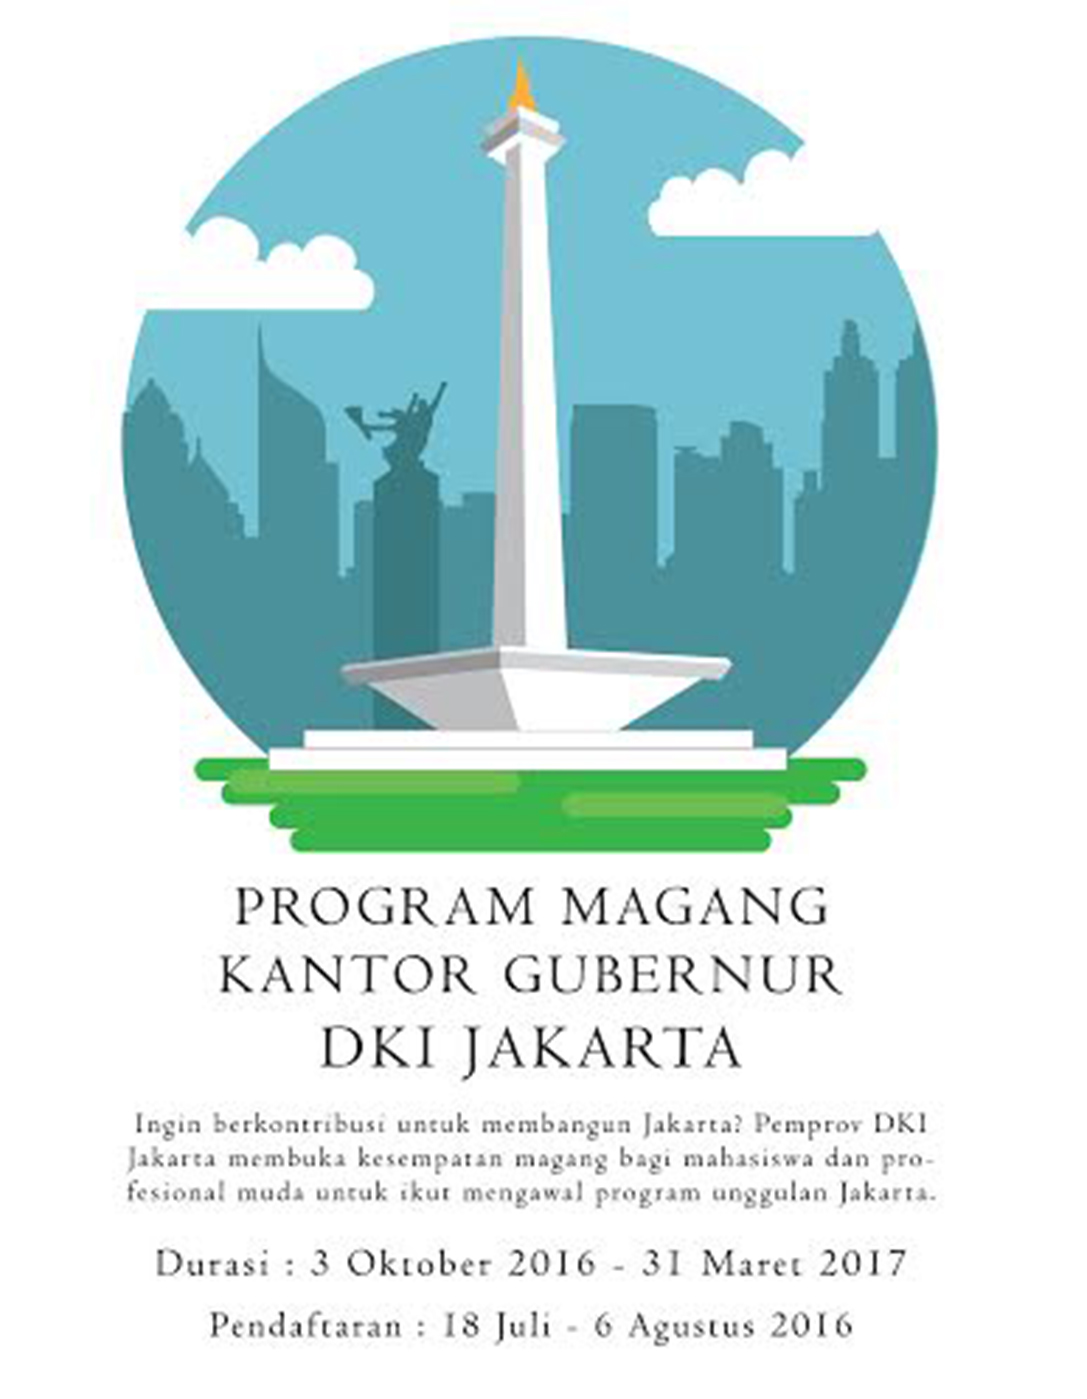 program magang kantor gubernur